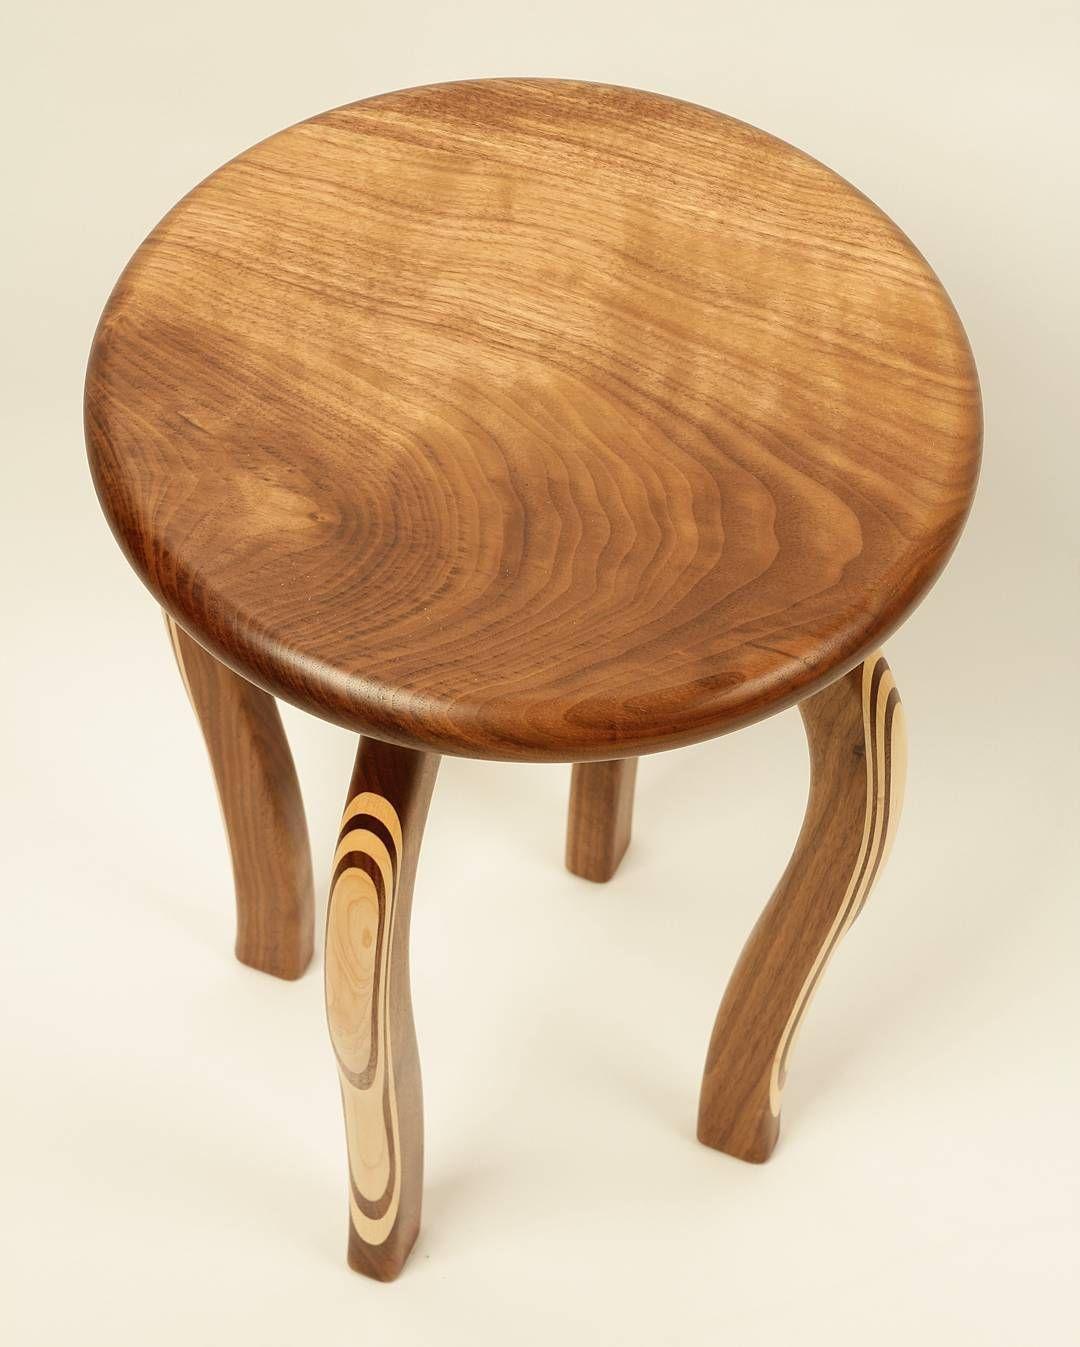 Stool 만들기 #호두나무 #단풍나무 #walnut #maple #woodworking by woodpluswood